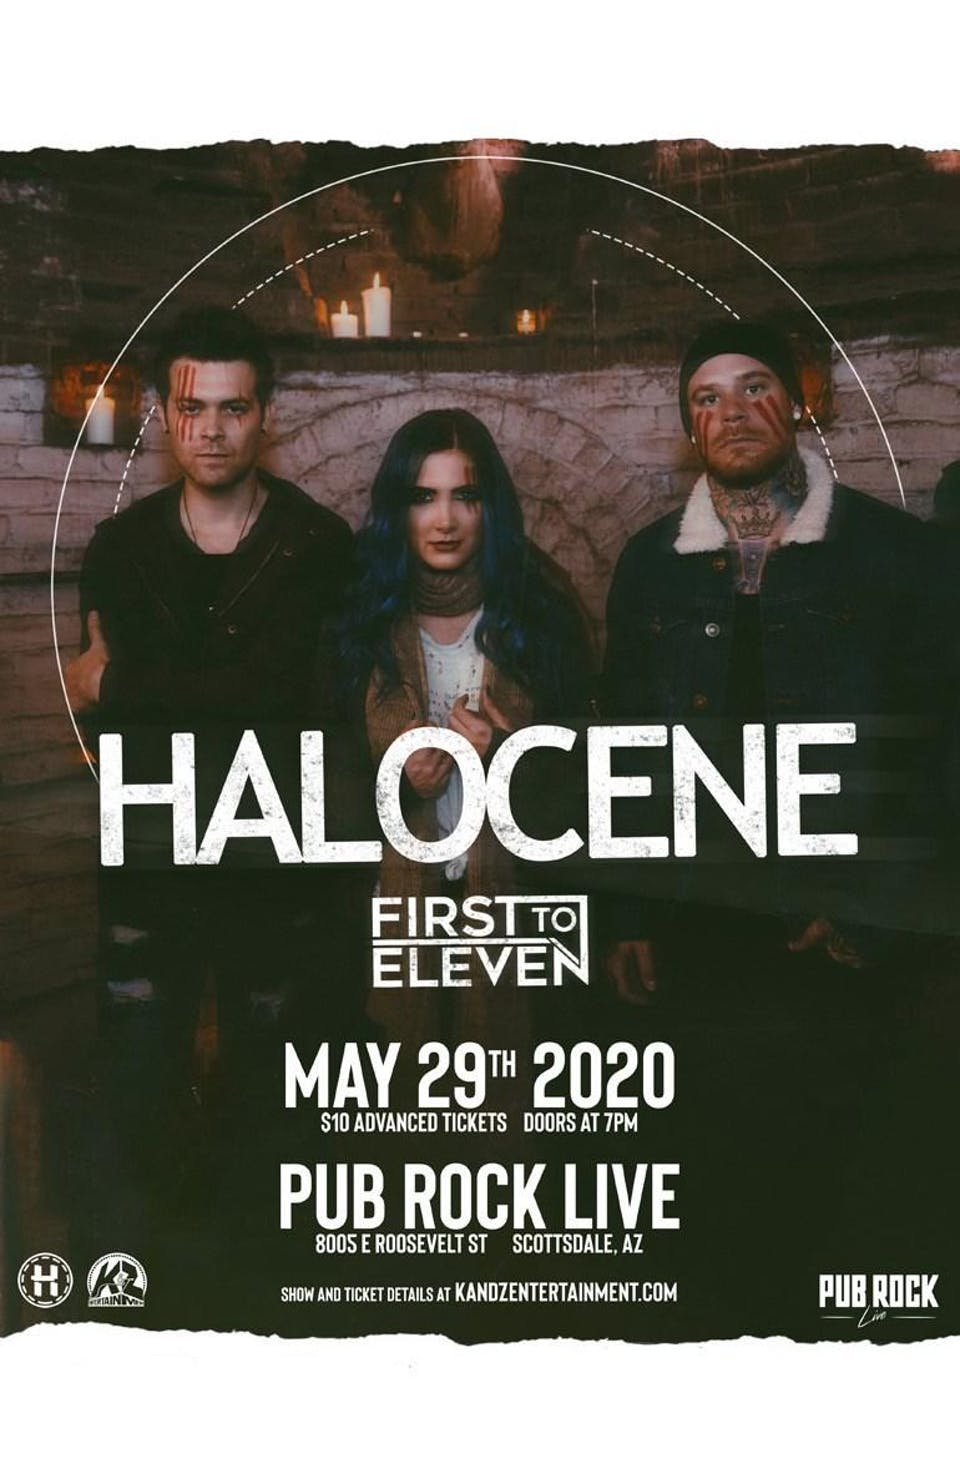 HALOCENE at Pub Rock Live